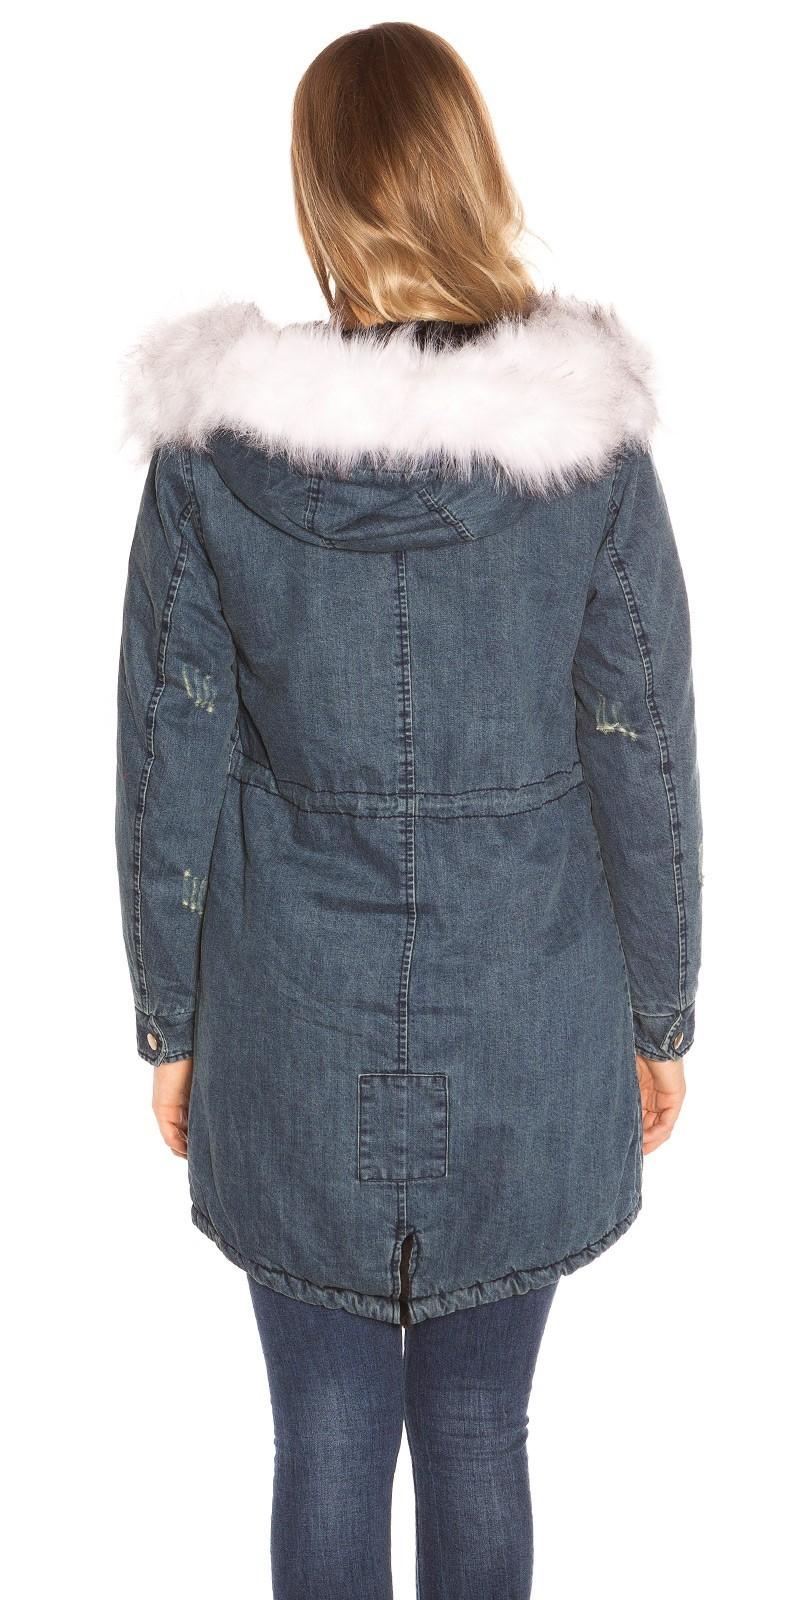 Riflová zimná bunda s kožušinou White – Sissy Boutique c2bcc5bed5b